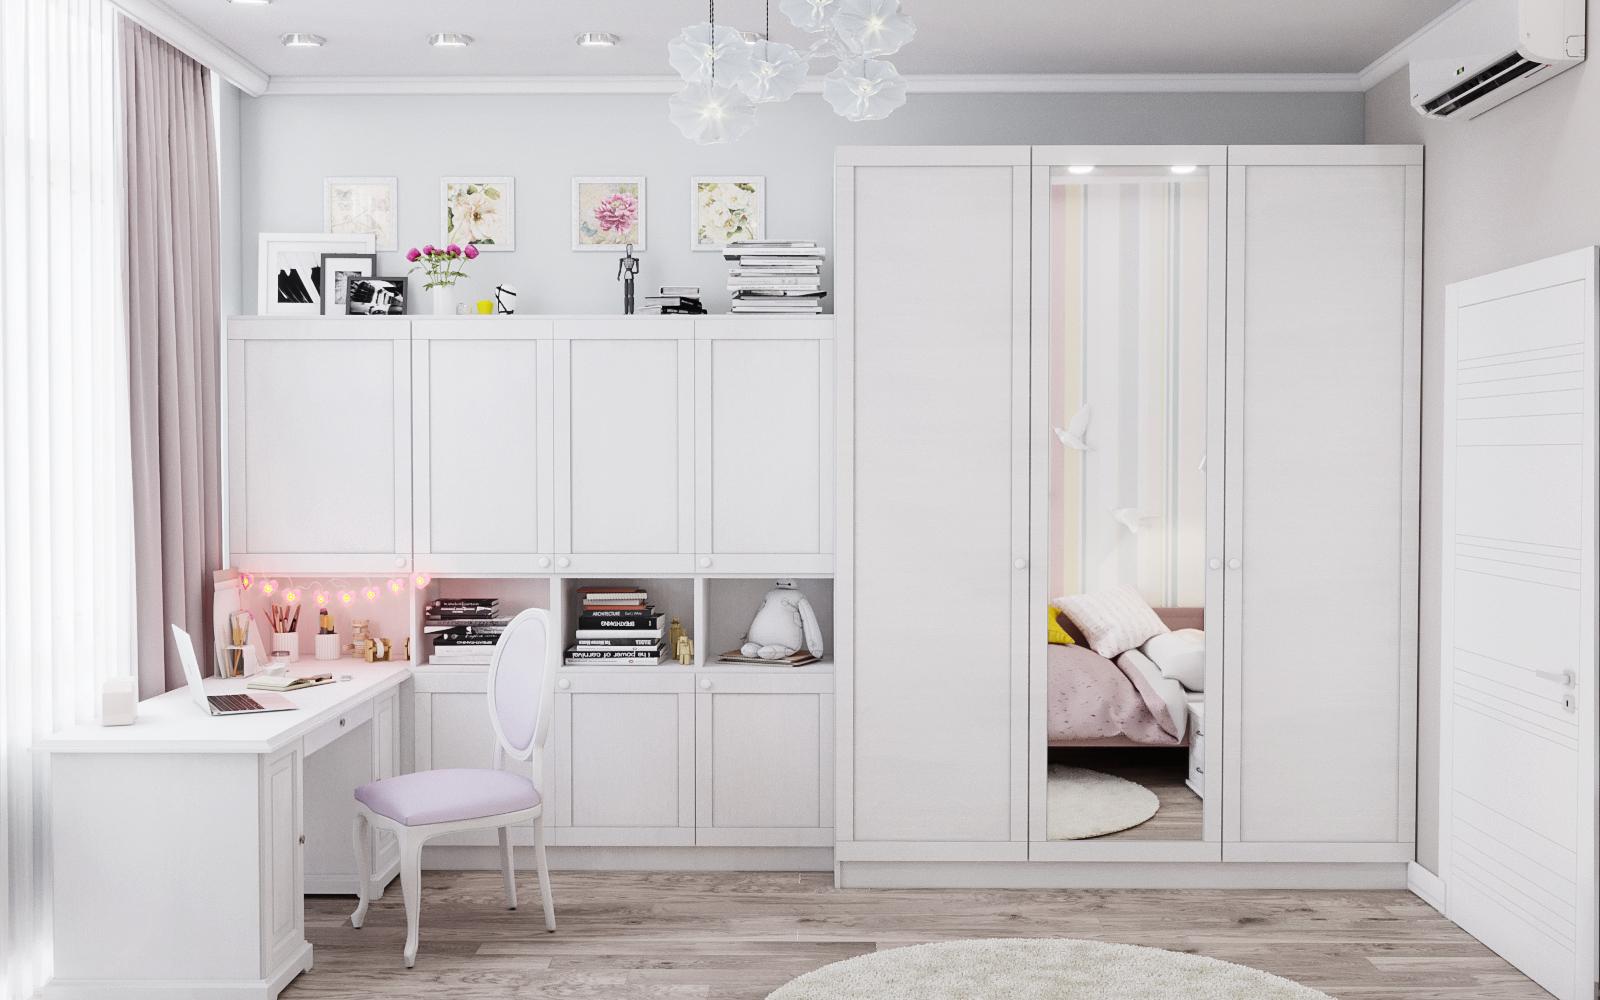 Wohnung in Odessa in 3d max corona render Bild